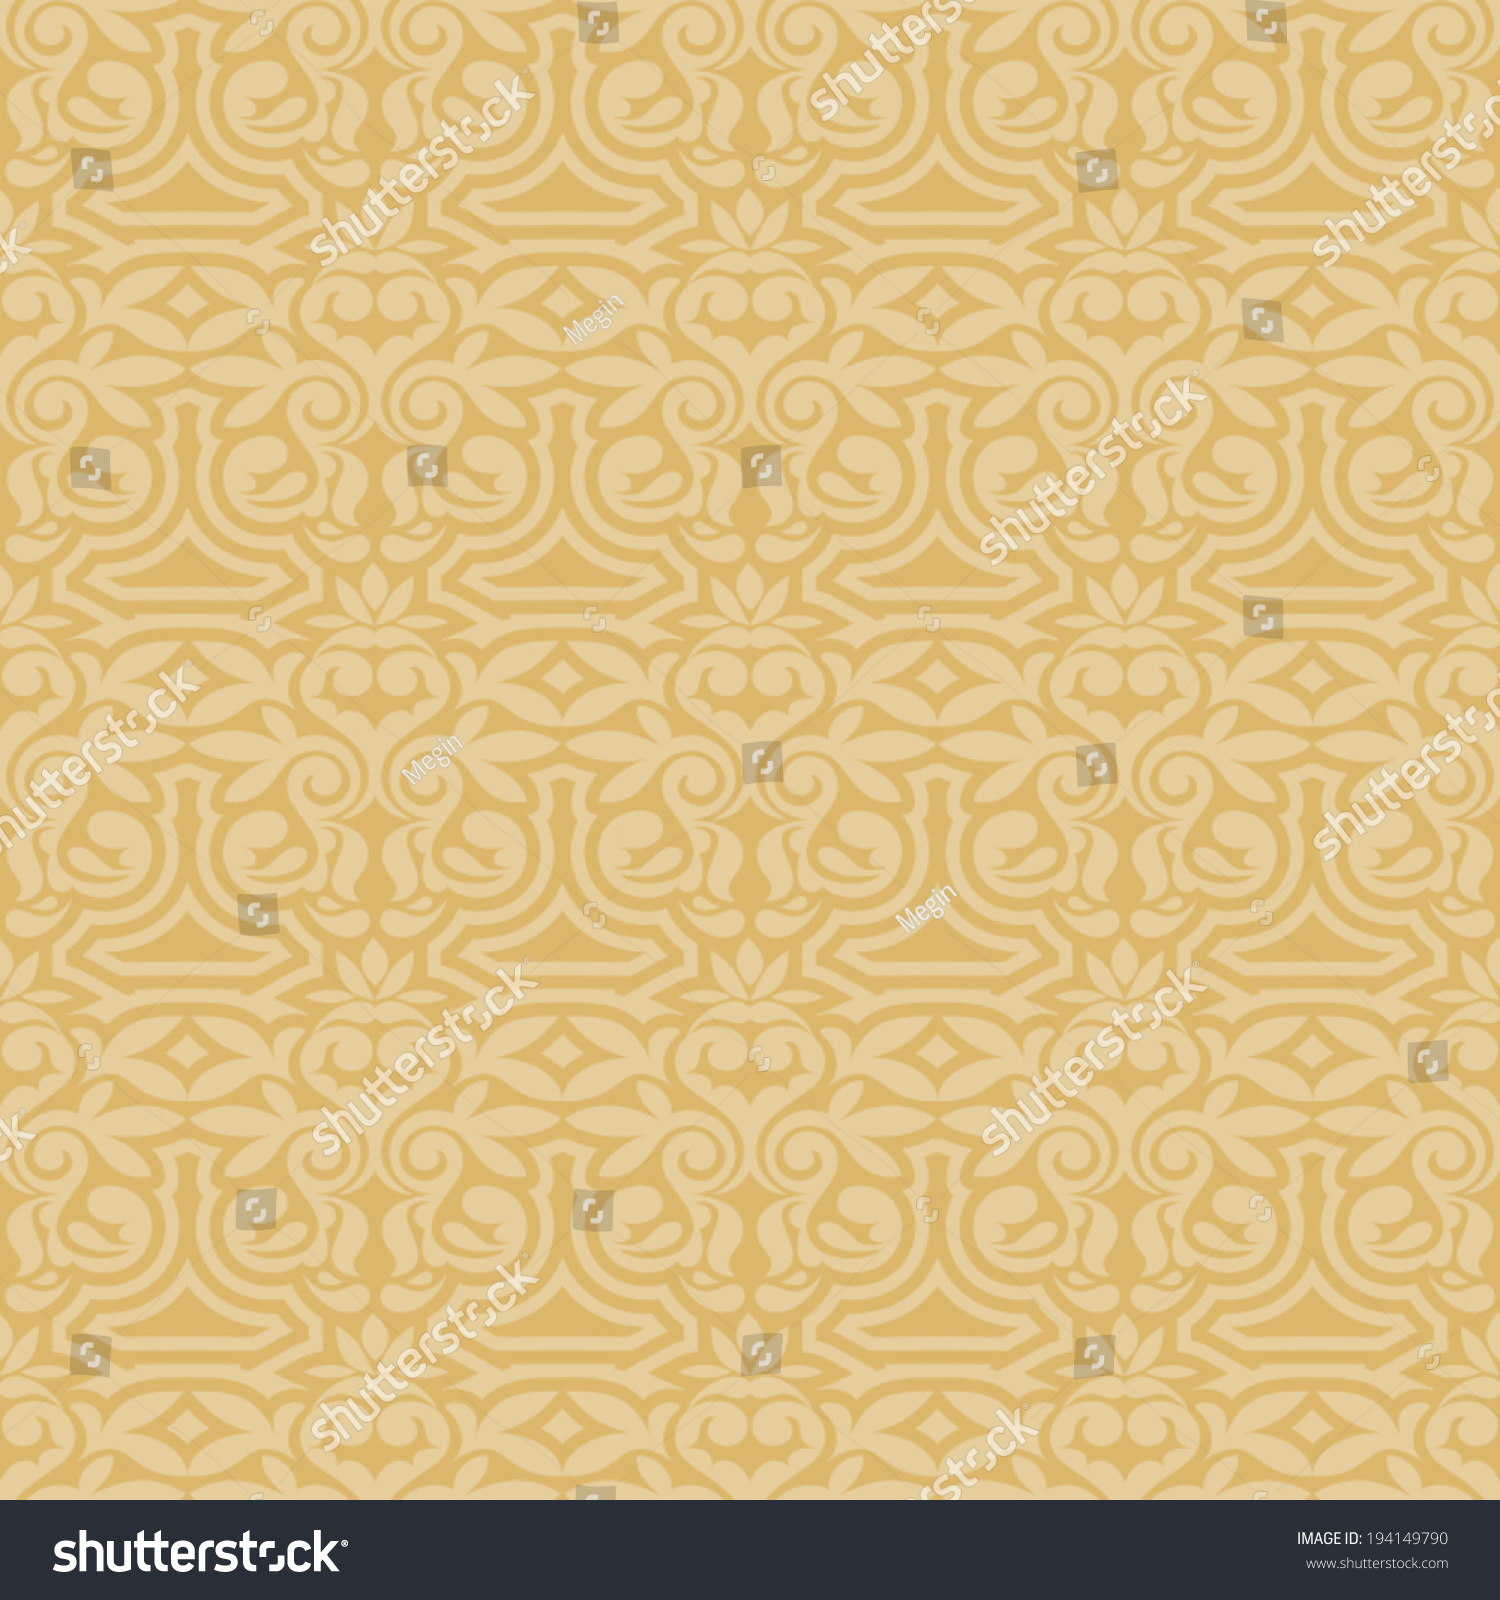 Elegant Cream Hallway With Damask Wallpaper: Damask Beautiful Background Rich Luxury Ornamentation